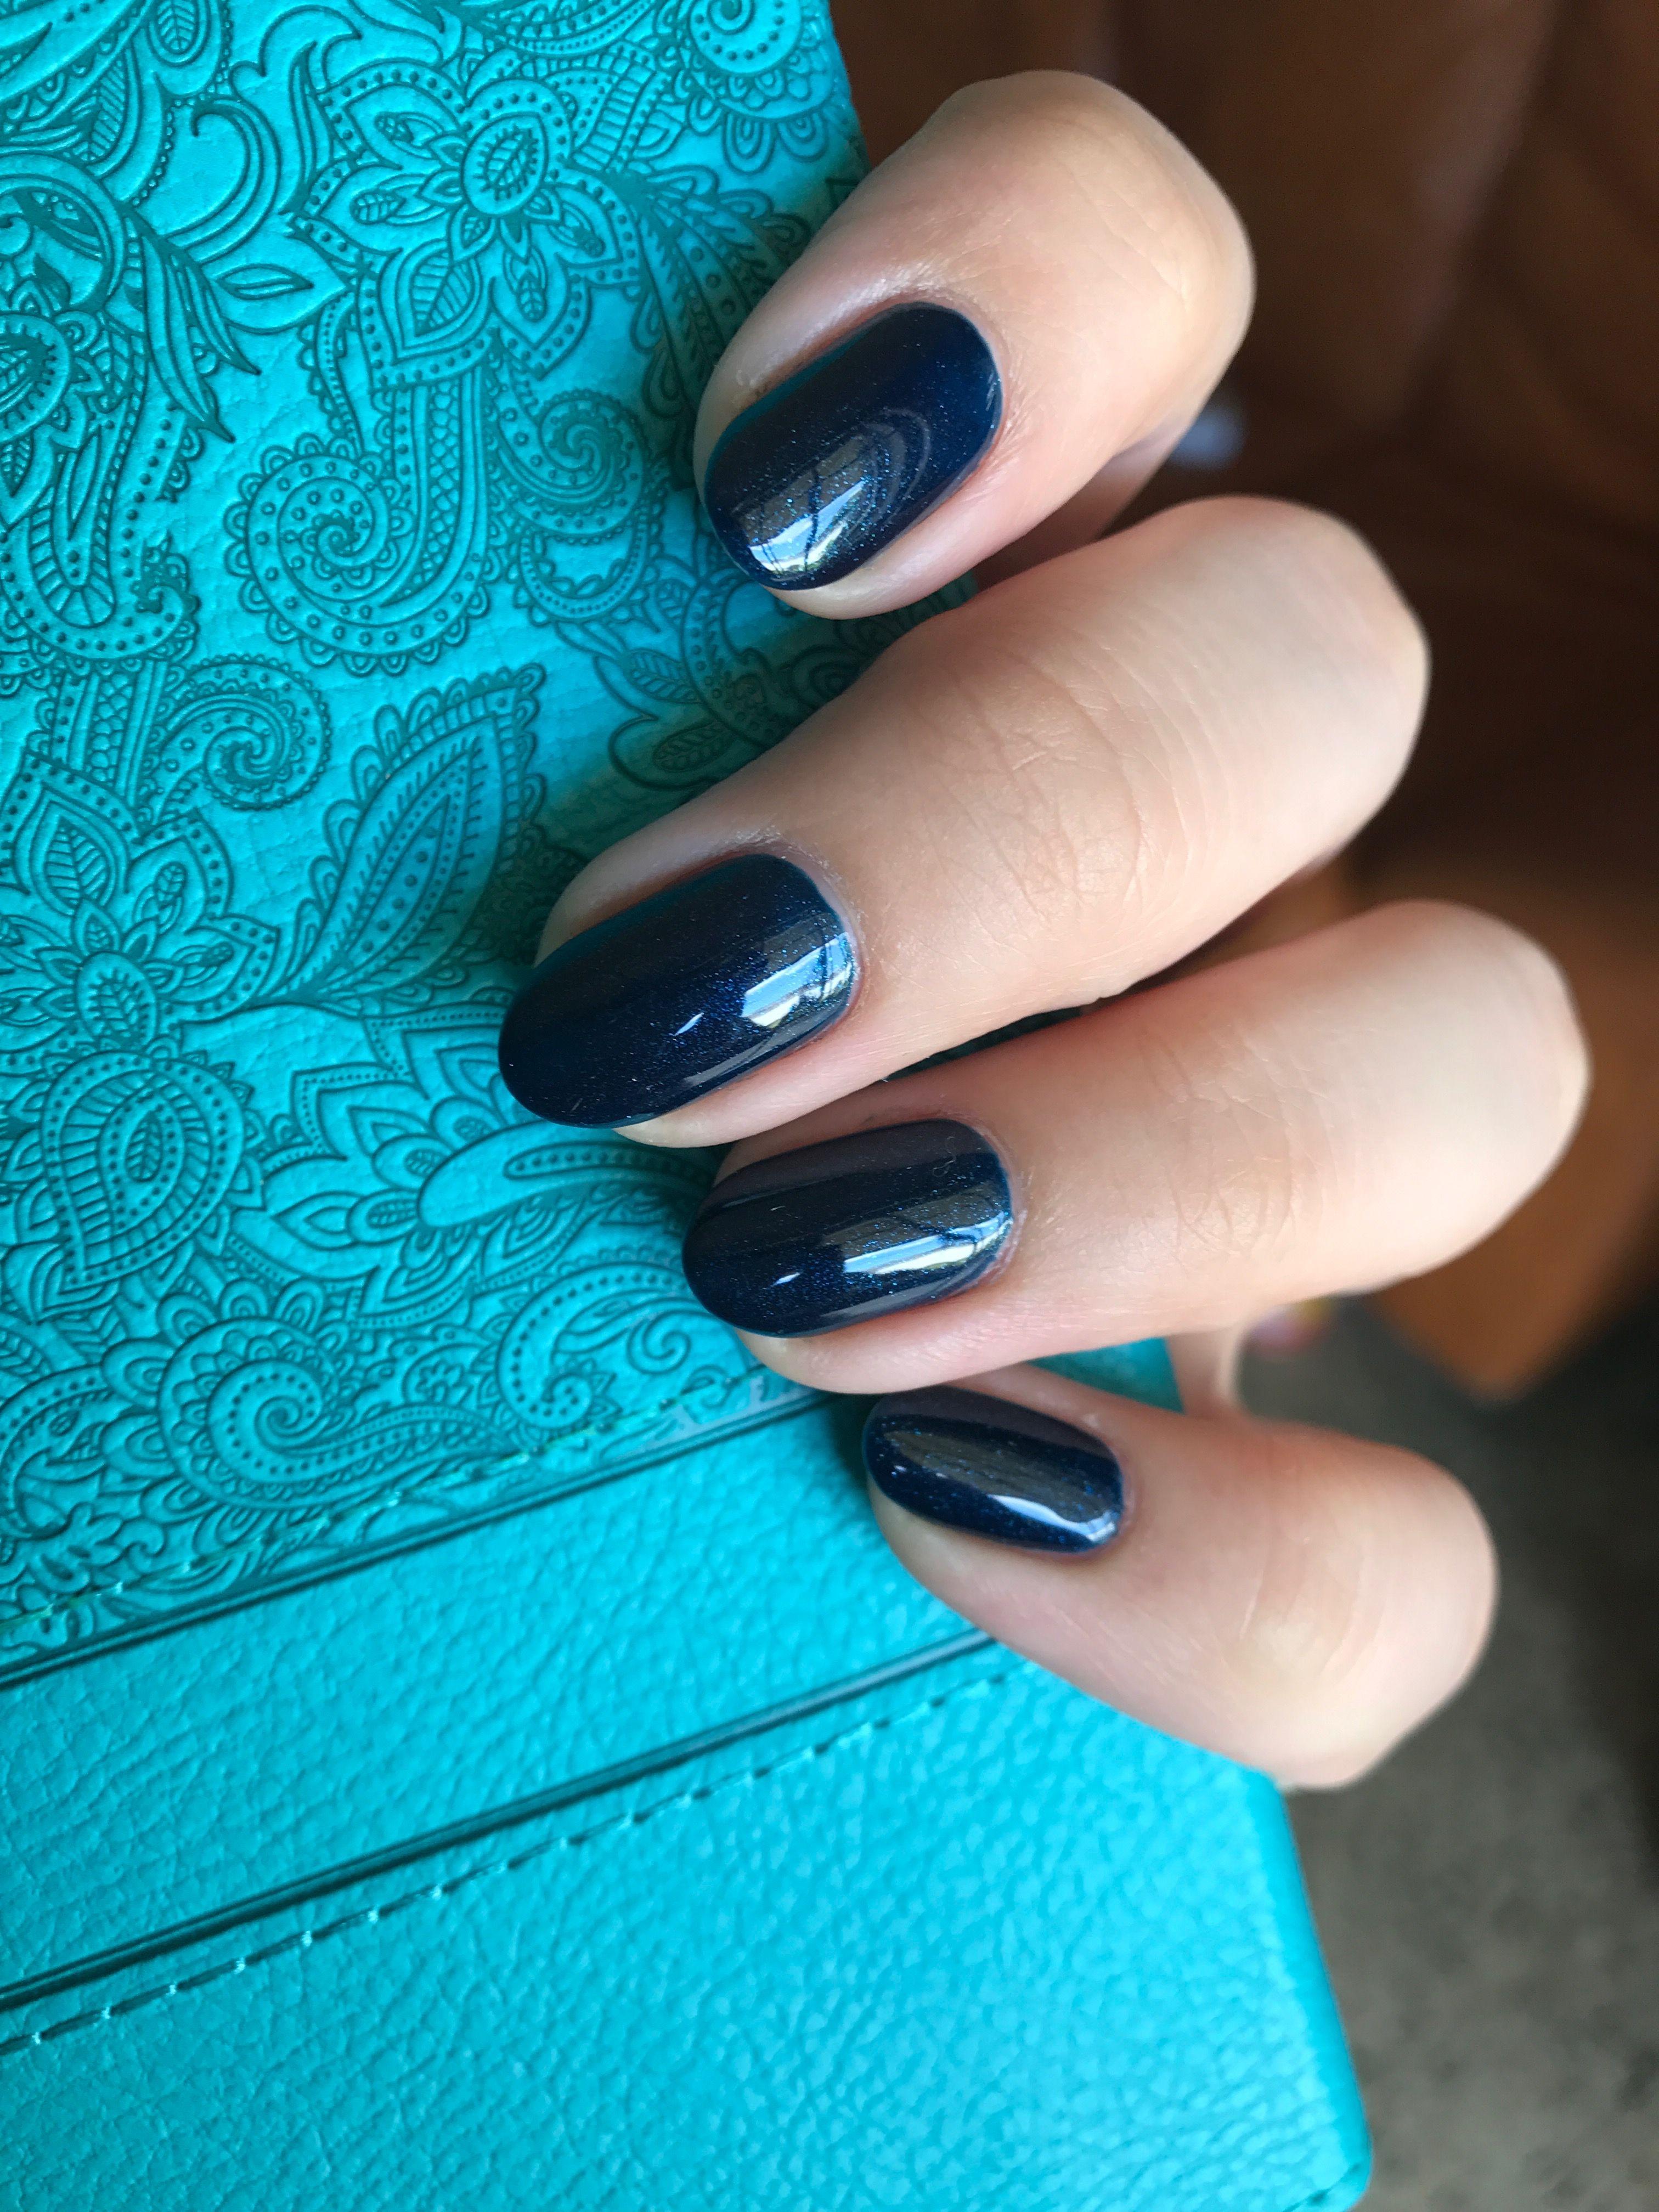 Dark blue shellac, oval nails #shellac | Blue shellac ...